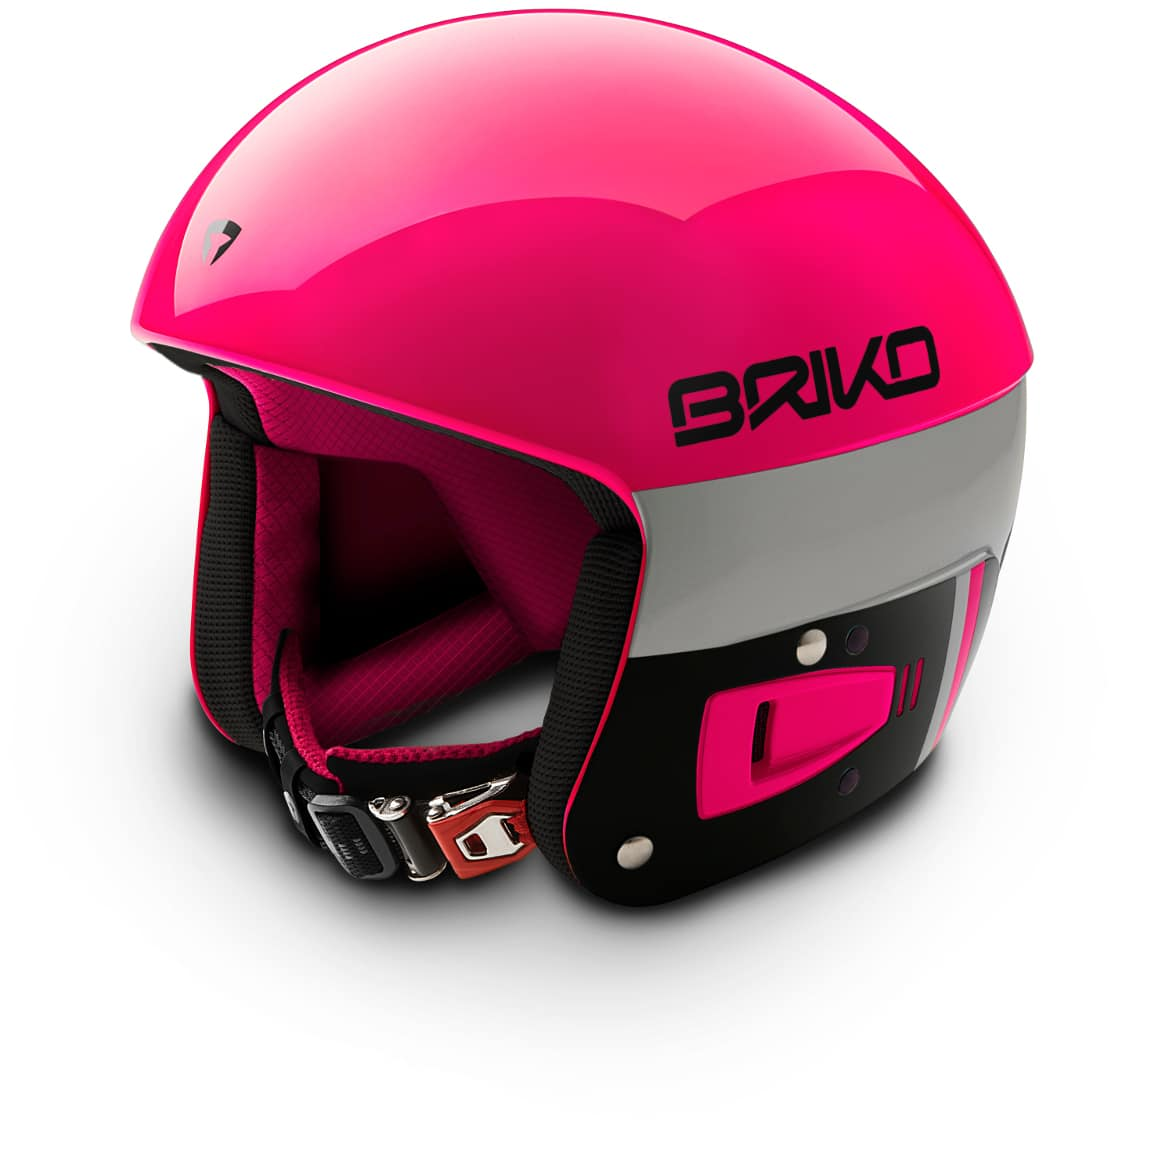 Briko Vulcano FIS Helmet - Pink Black